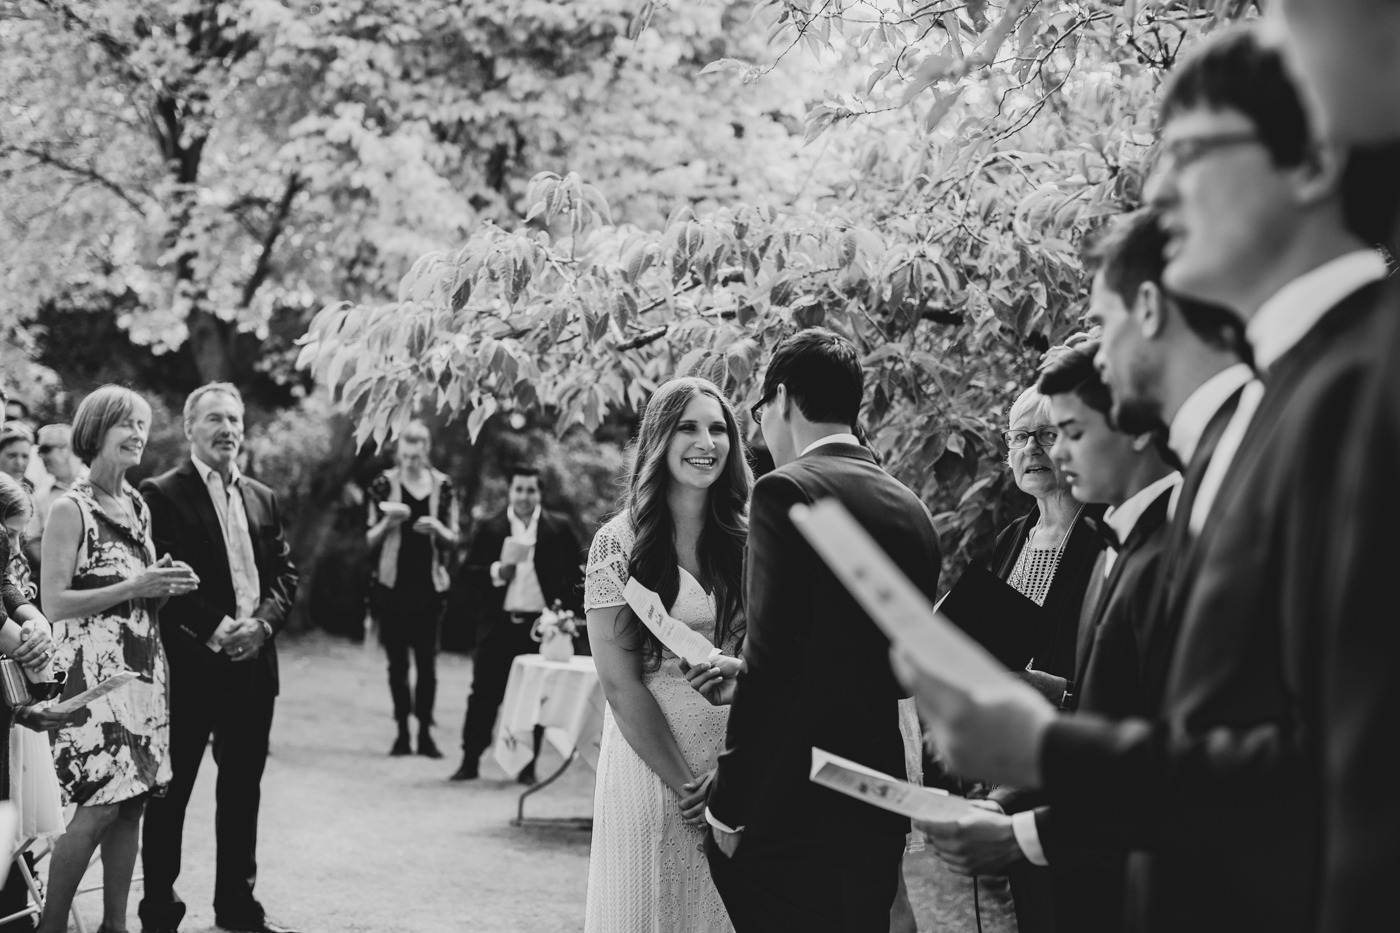 Ariana & Tim - Dunedin, New Zealand Wedding - Destination Wedding - Samantha Heather Photography-94.jpg